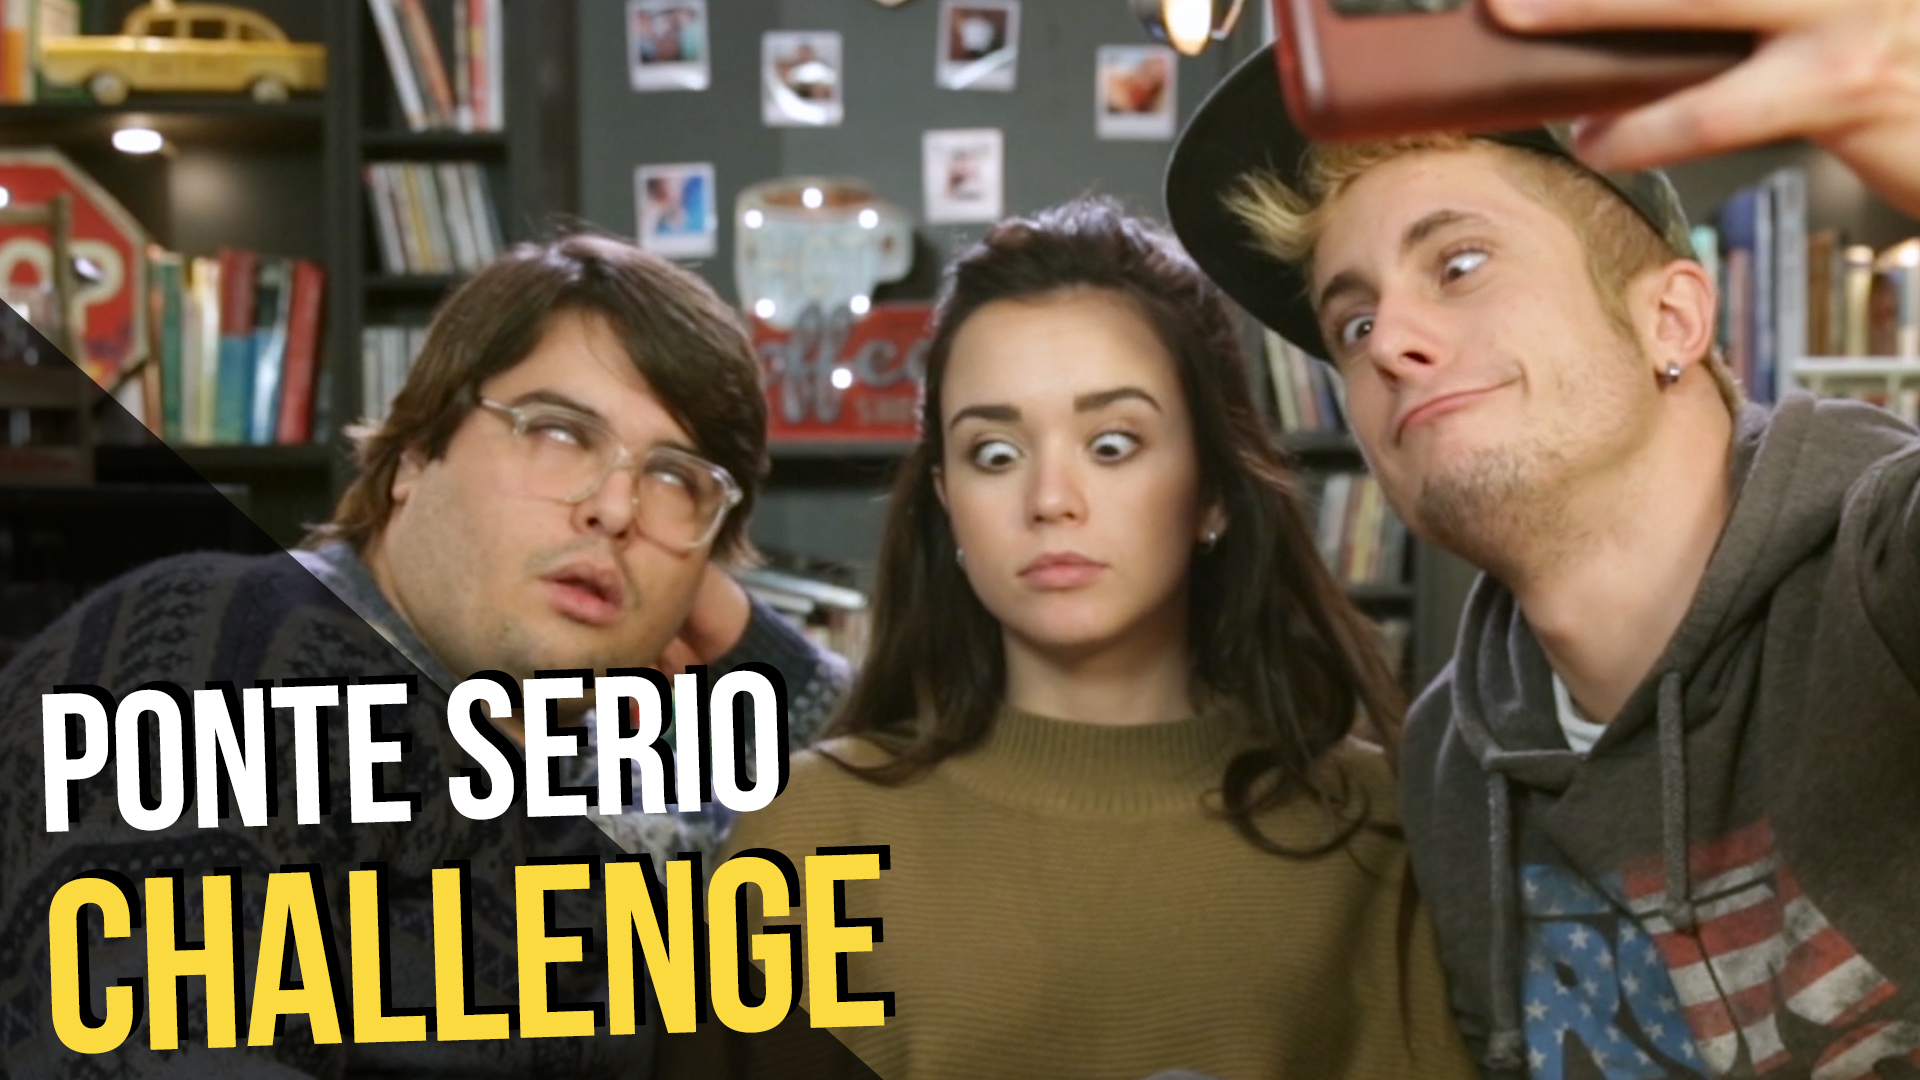 Temporada 1 ¡No te rías Challenge!